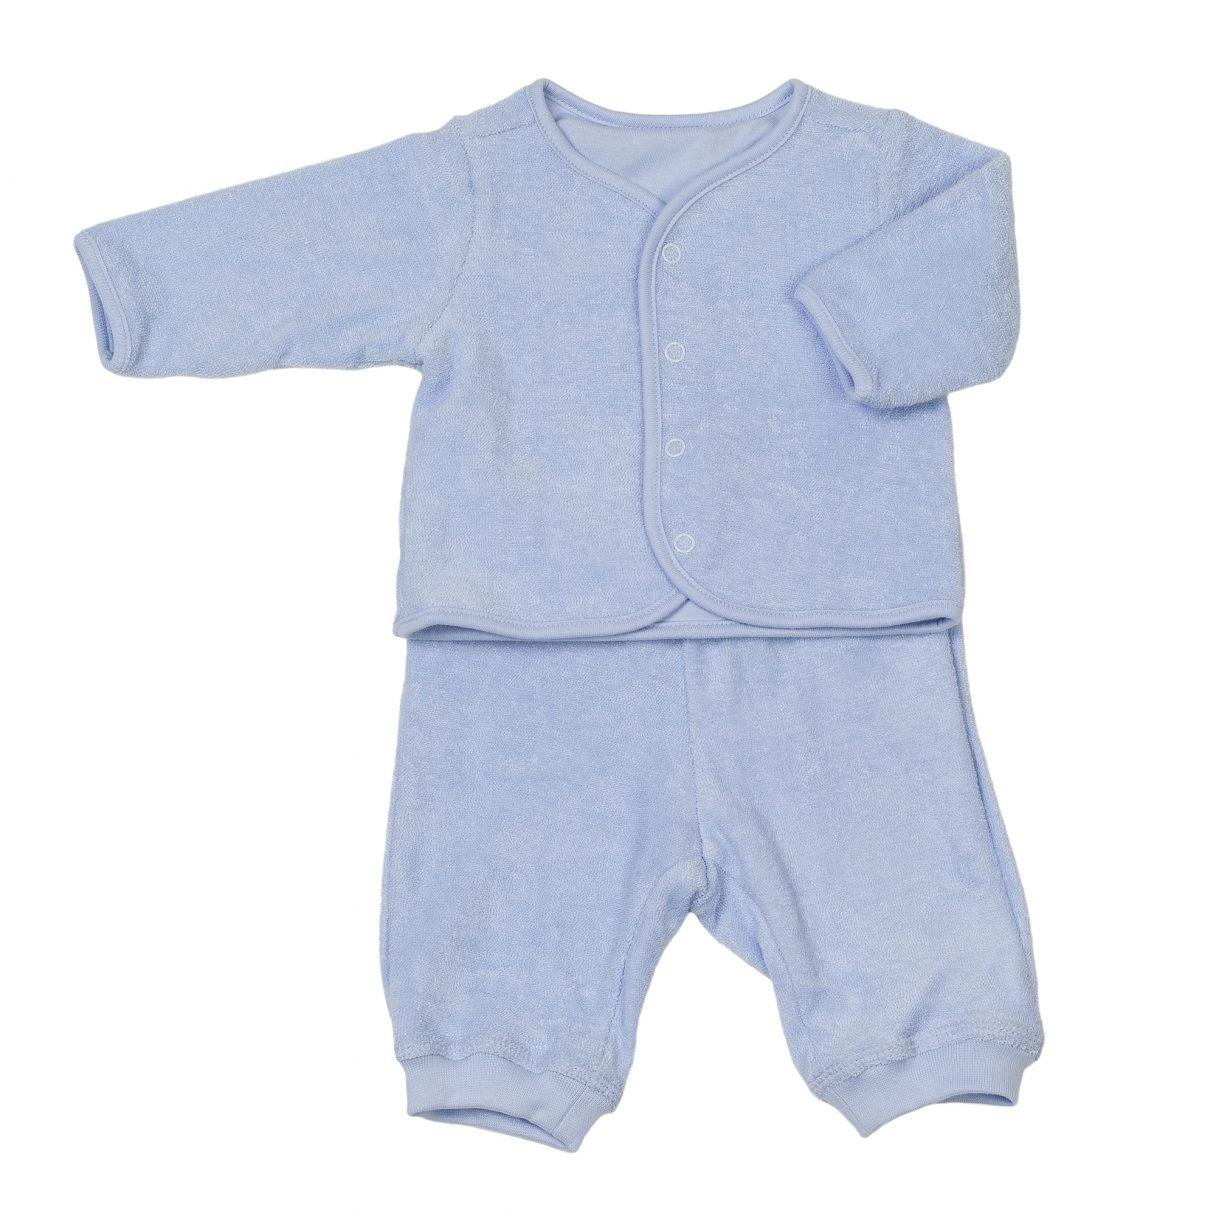 Baby Organic Cotton Sweatsuit